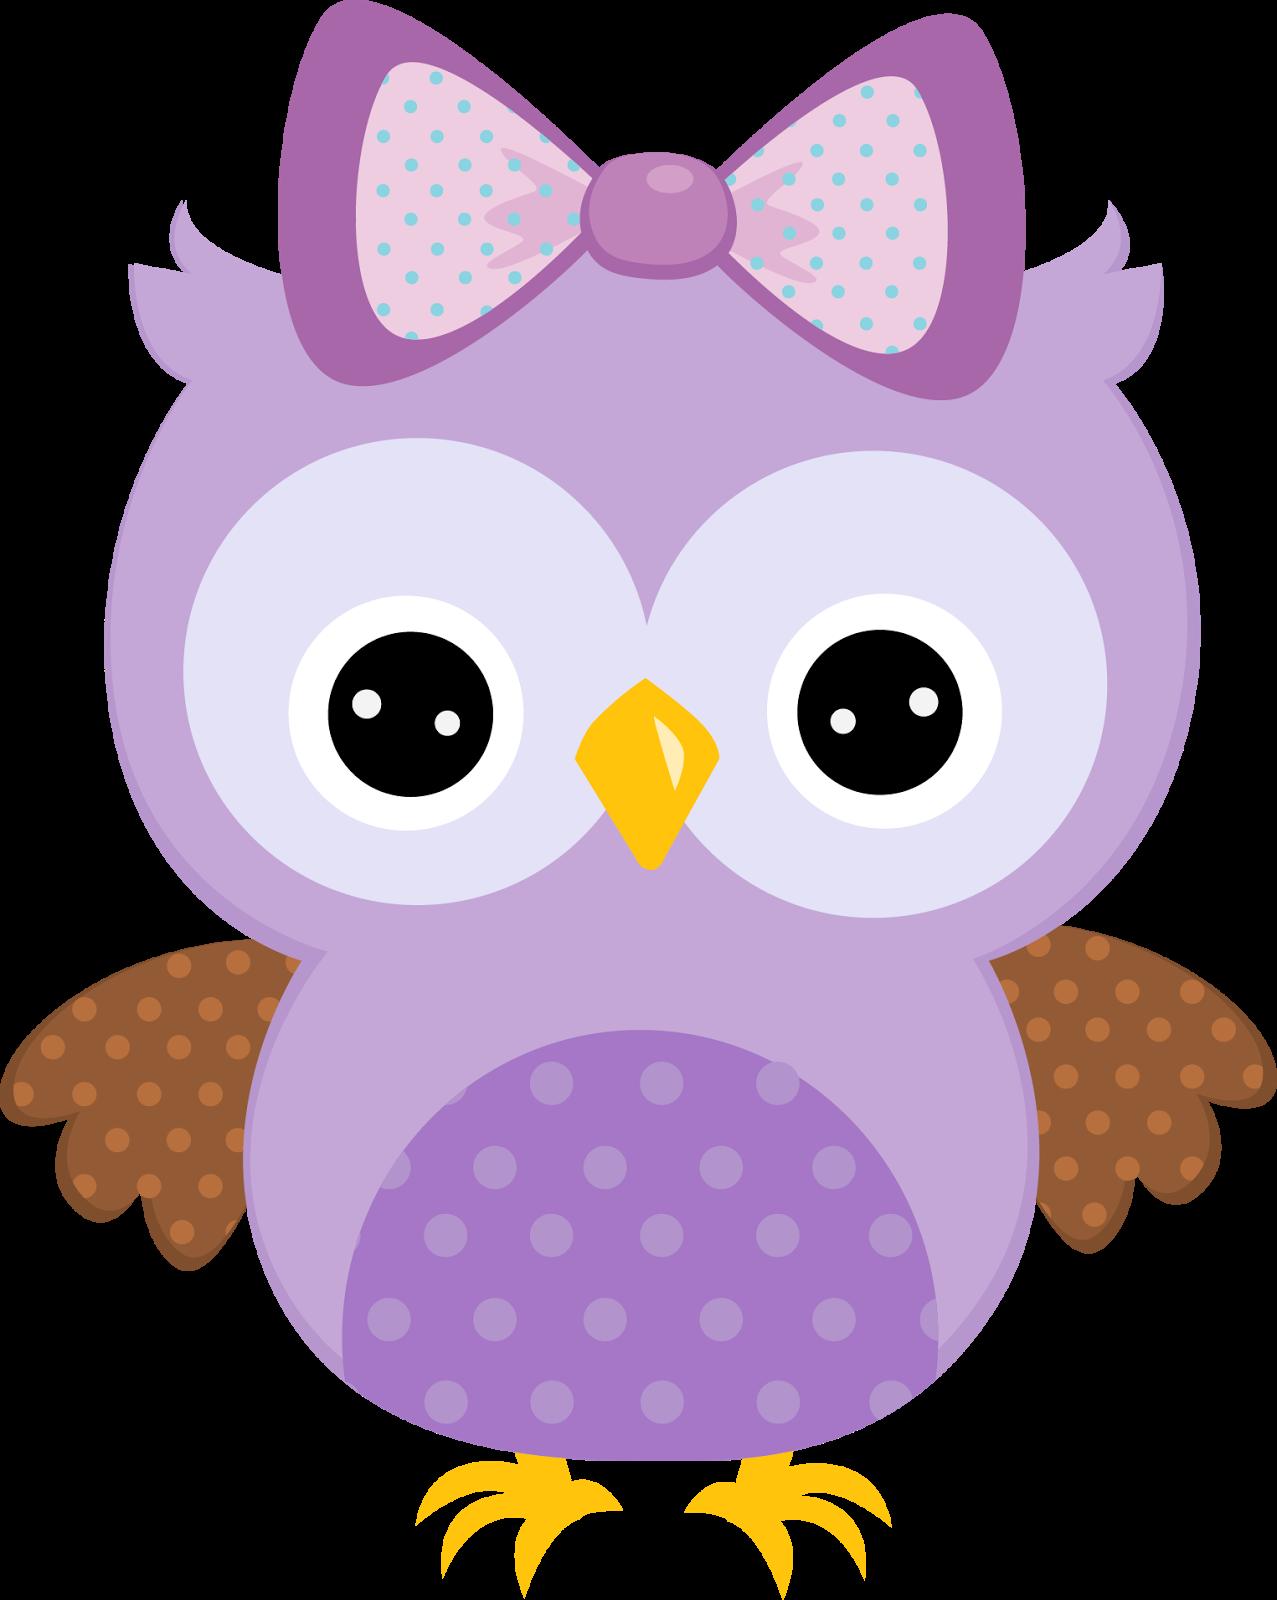 Clipart thanksgiving owls jpg freeuse download IMÁGENES DE BÚHOS | Buhos | Pinterest | Ideas para, Owl decorations ... jpg freeuse download